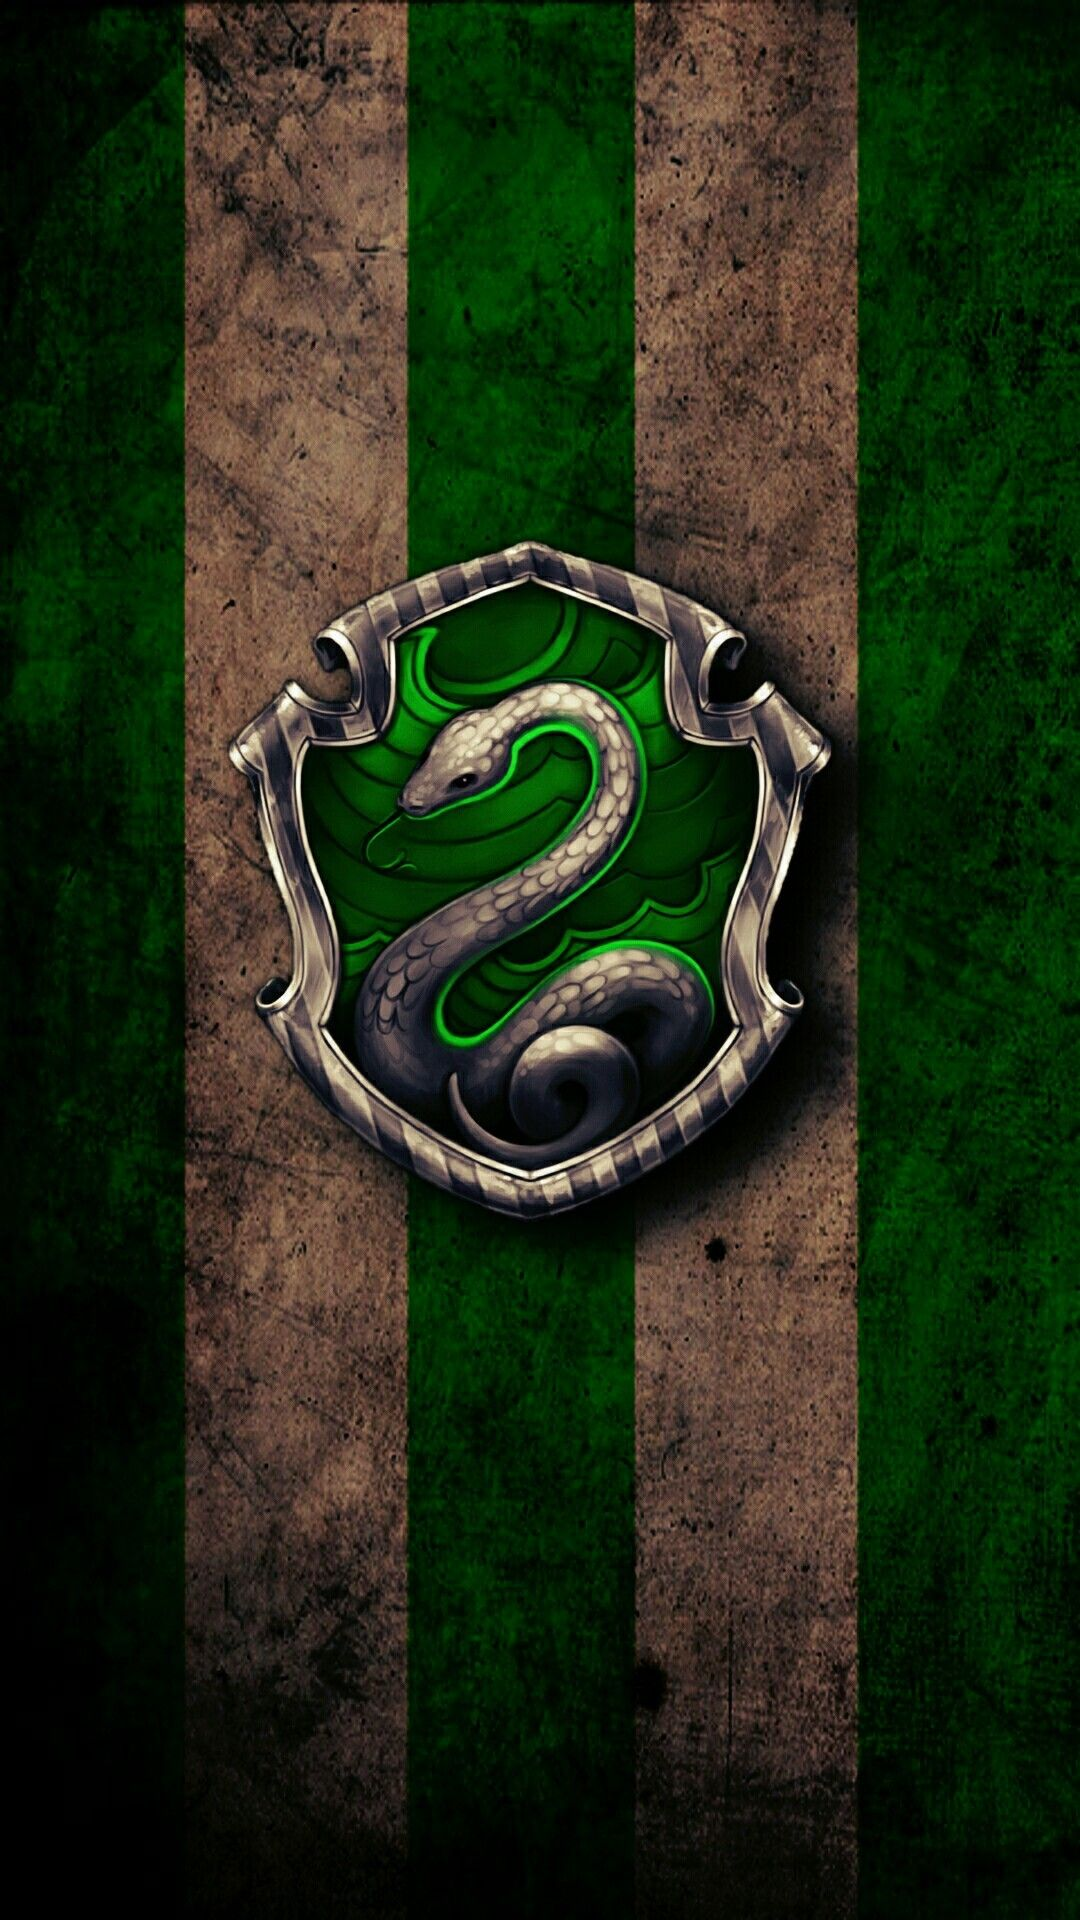 Best Harry Potter Slytherin Wallpaper 1080x1920 For Htc Harry Potter Iphone Wallpaper Harry Potter Wallpaper Slytherin Wallpaper